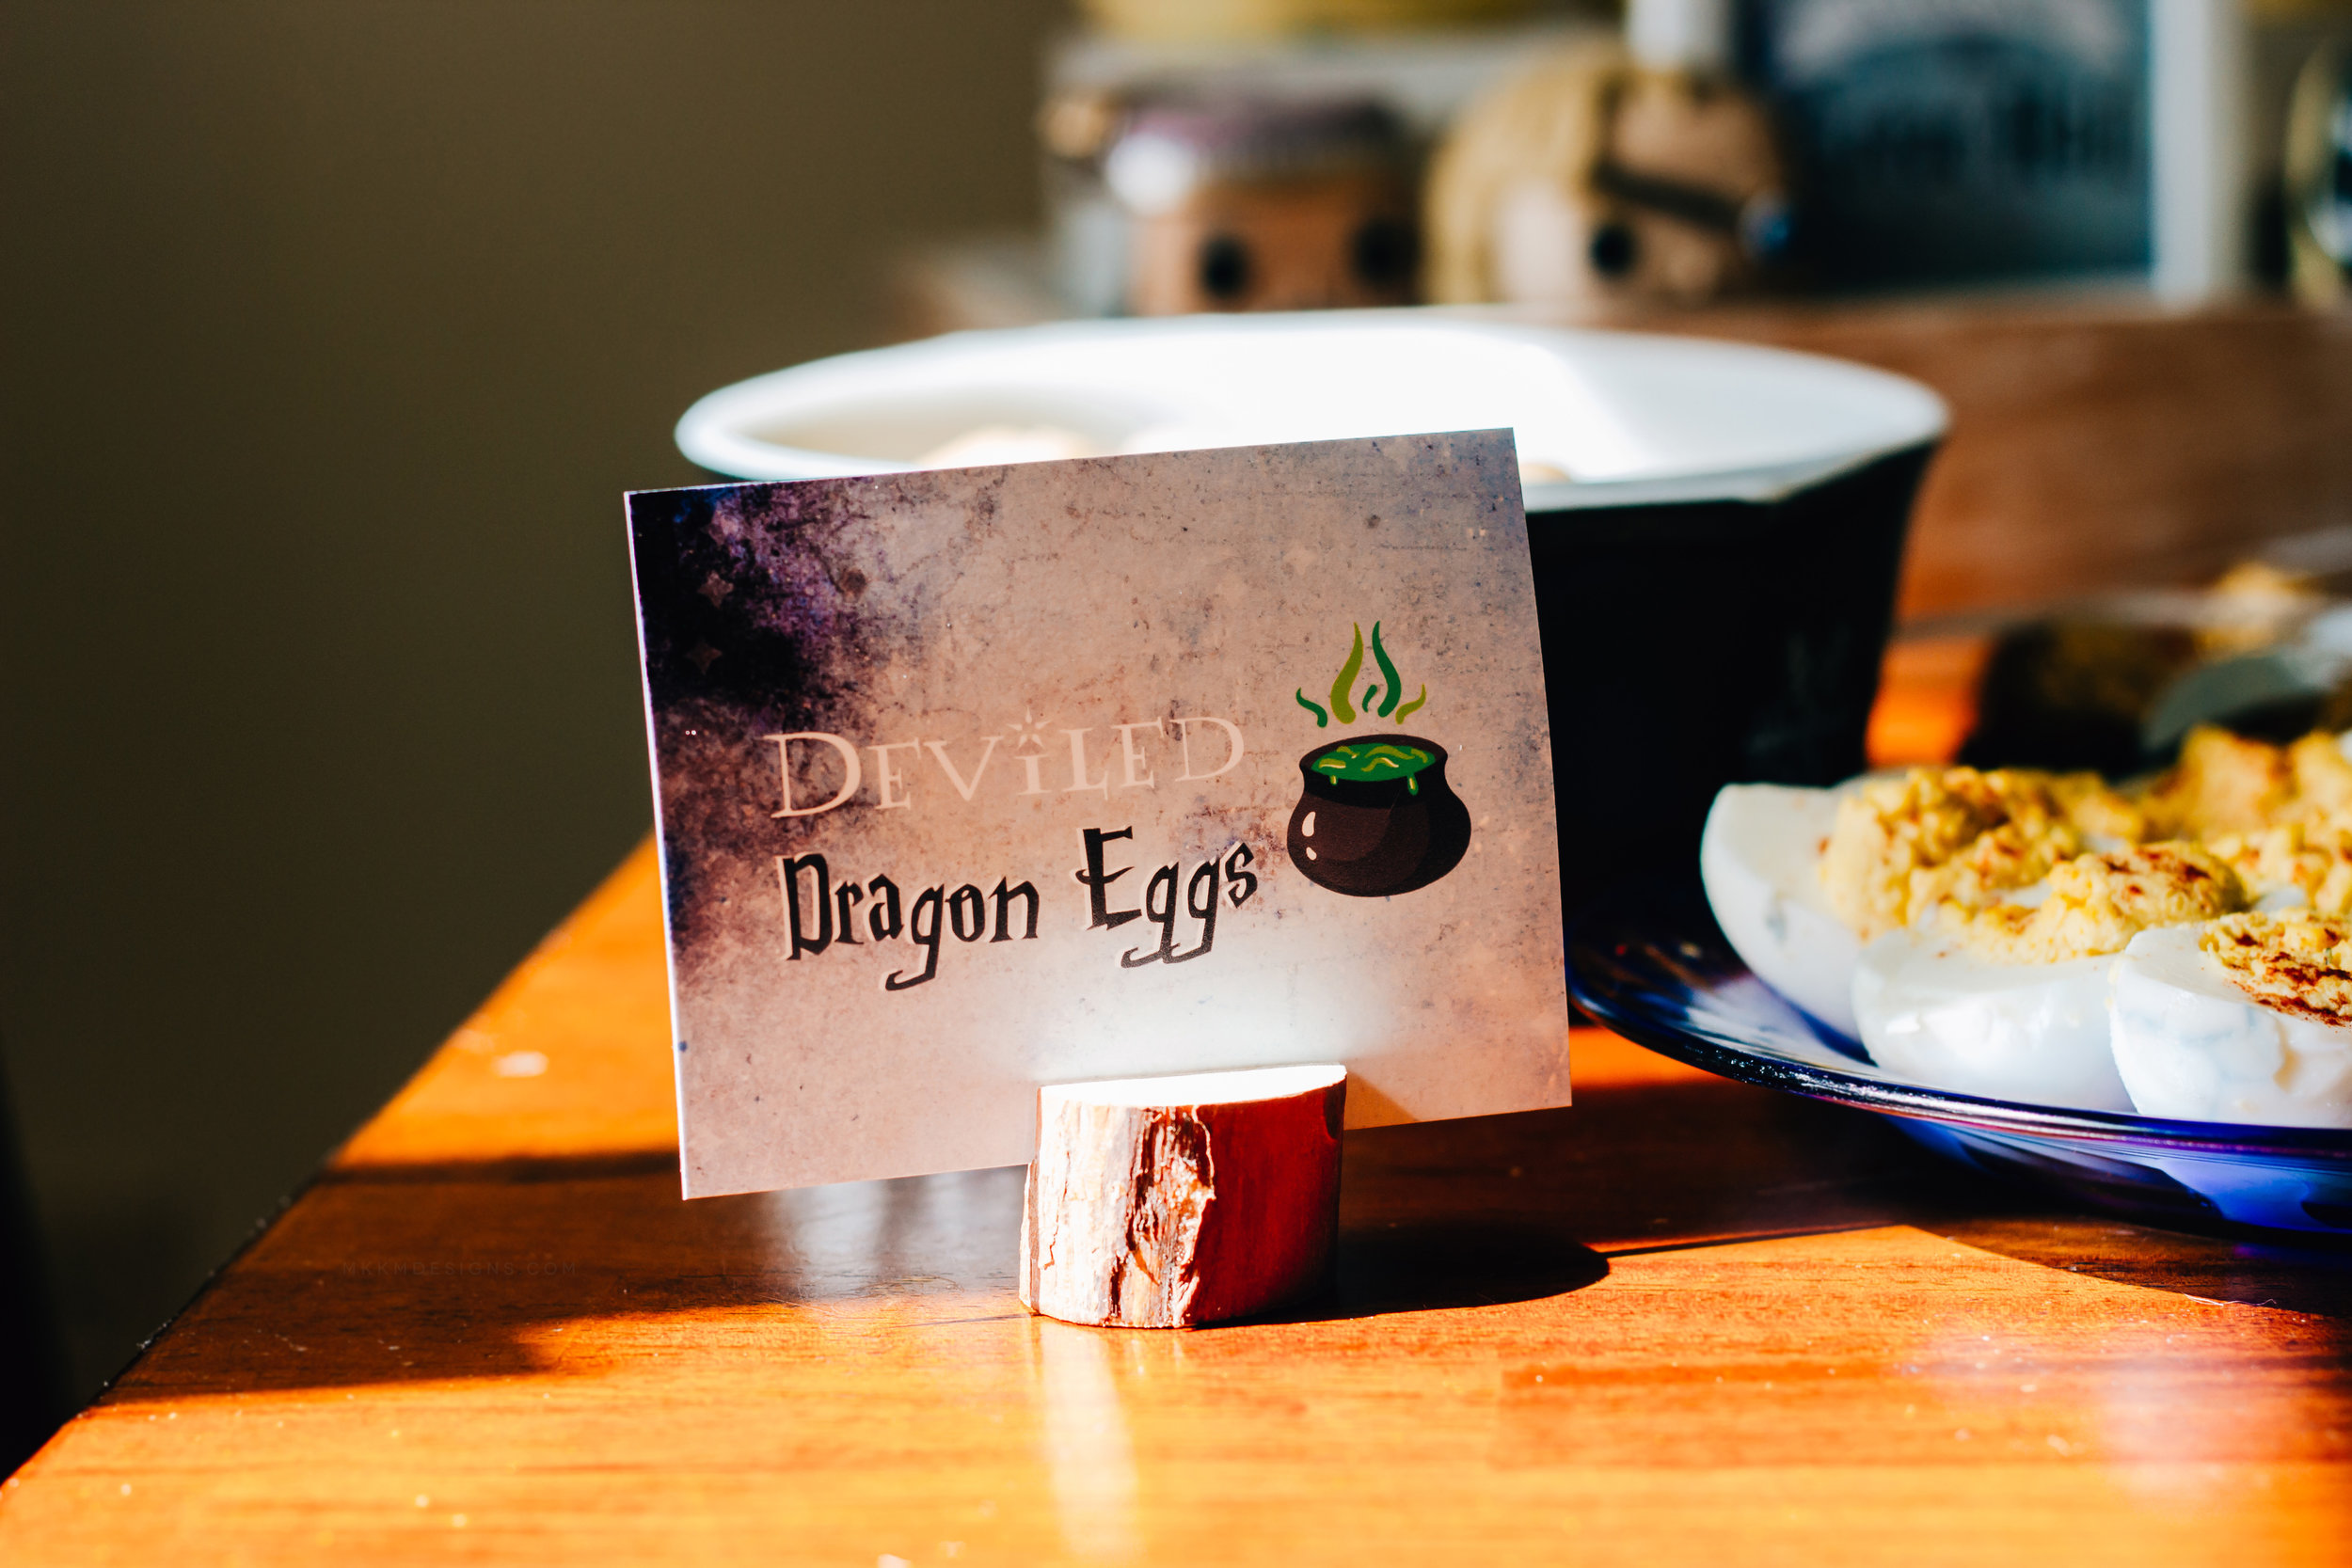 Deviled Dragon Eggs. Free printable Harry Potter food cards from shopmkkm.com